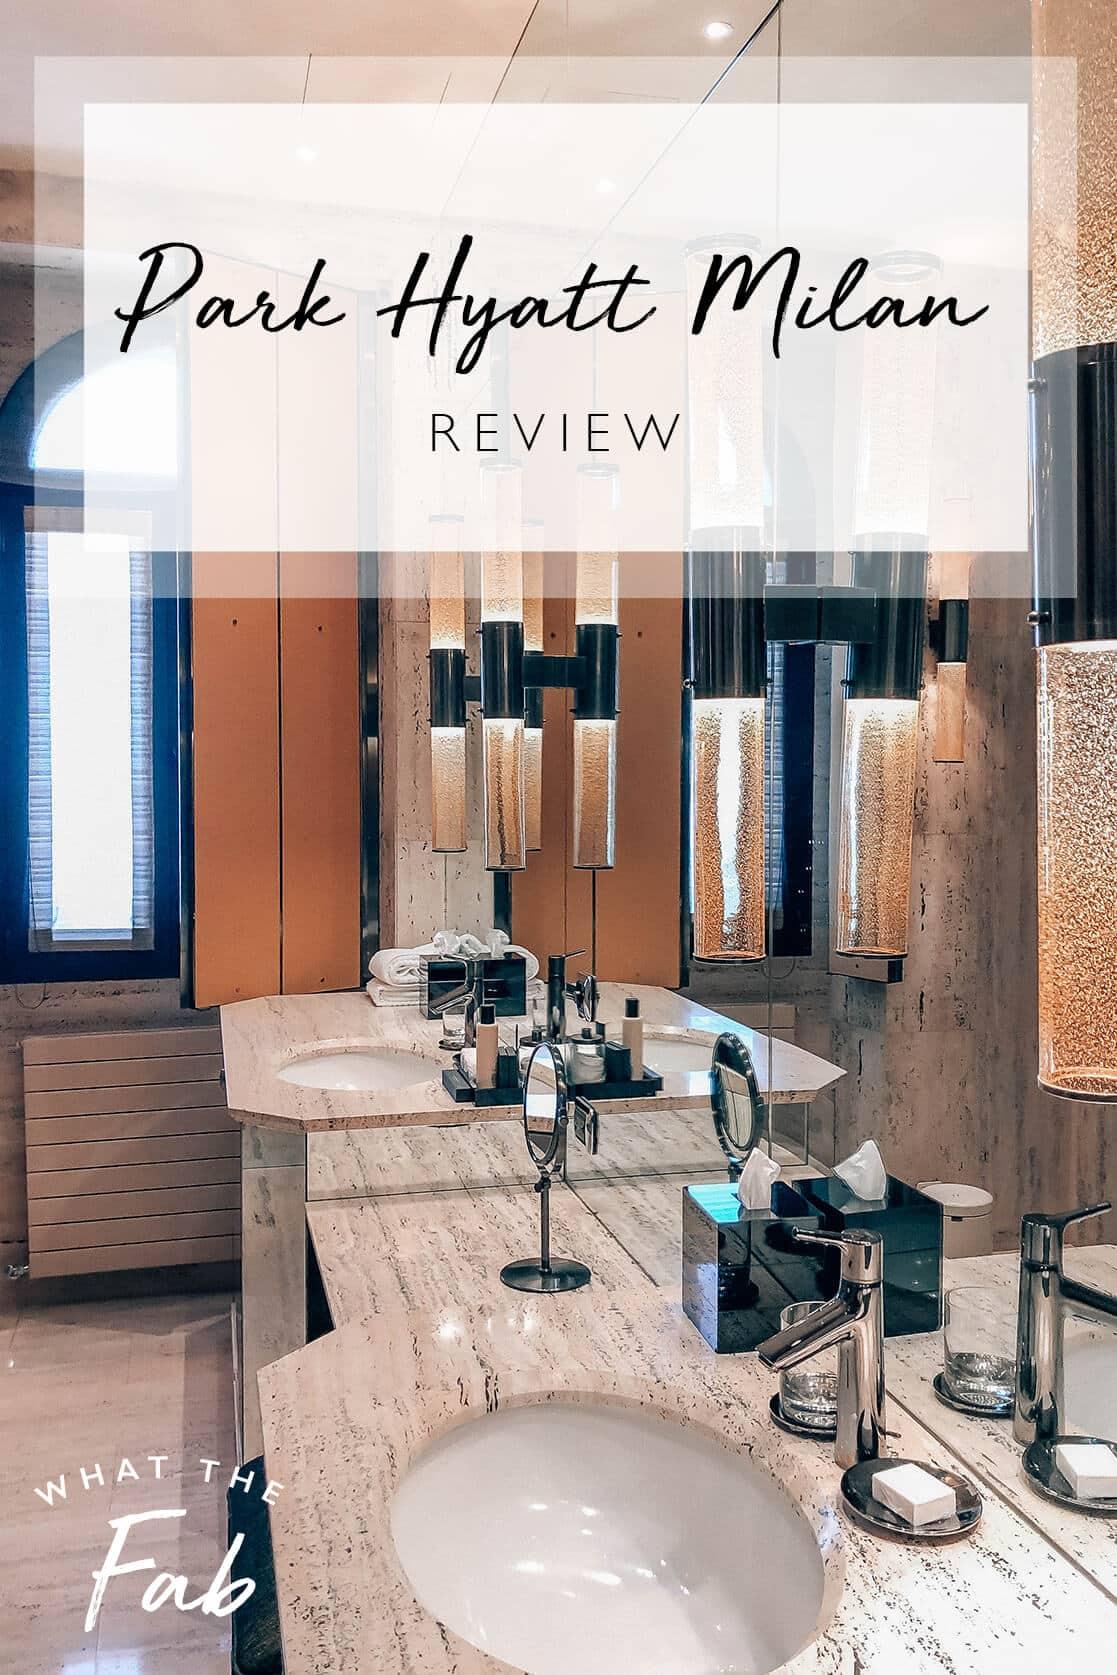 Park Hyatt Milan Review